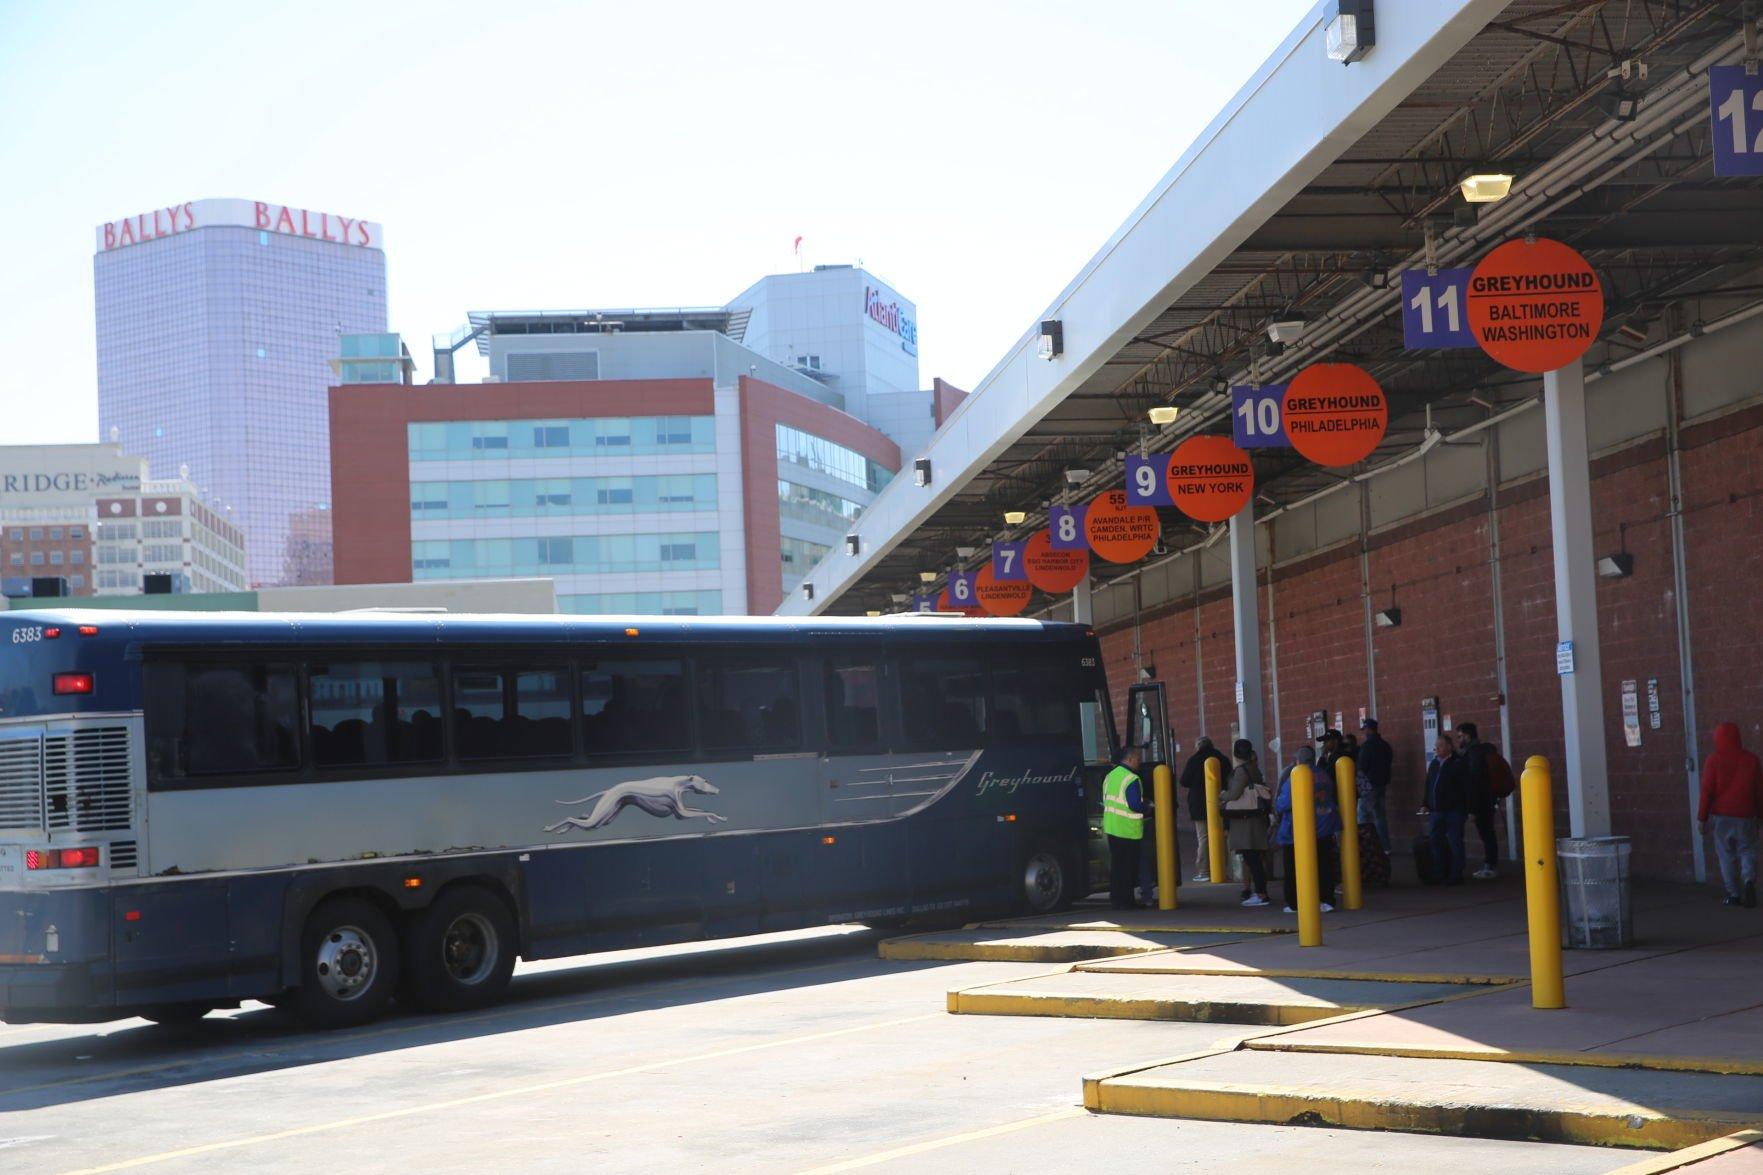 Greyhound bus tours new york city